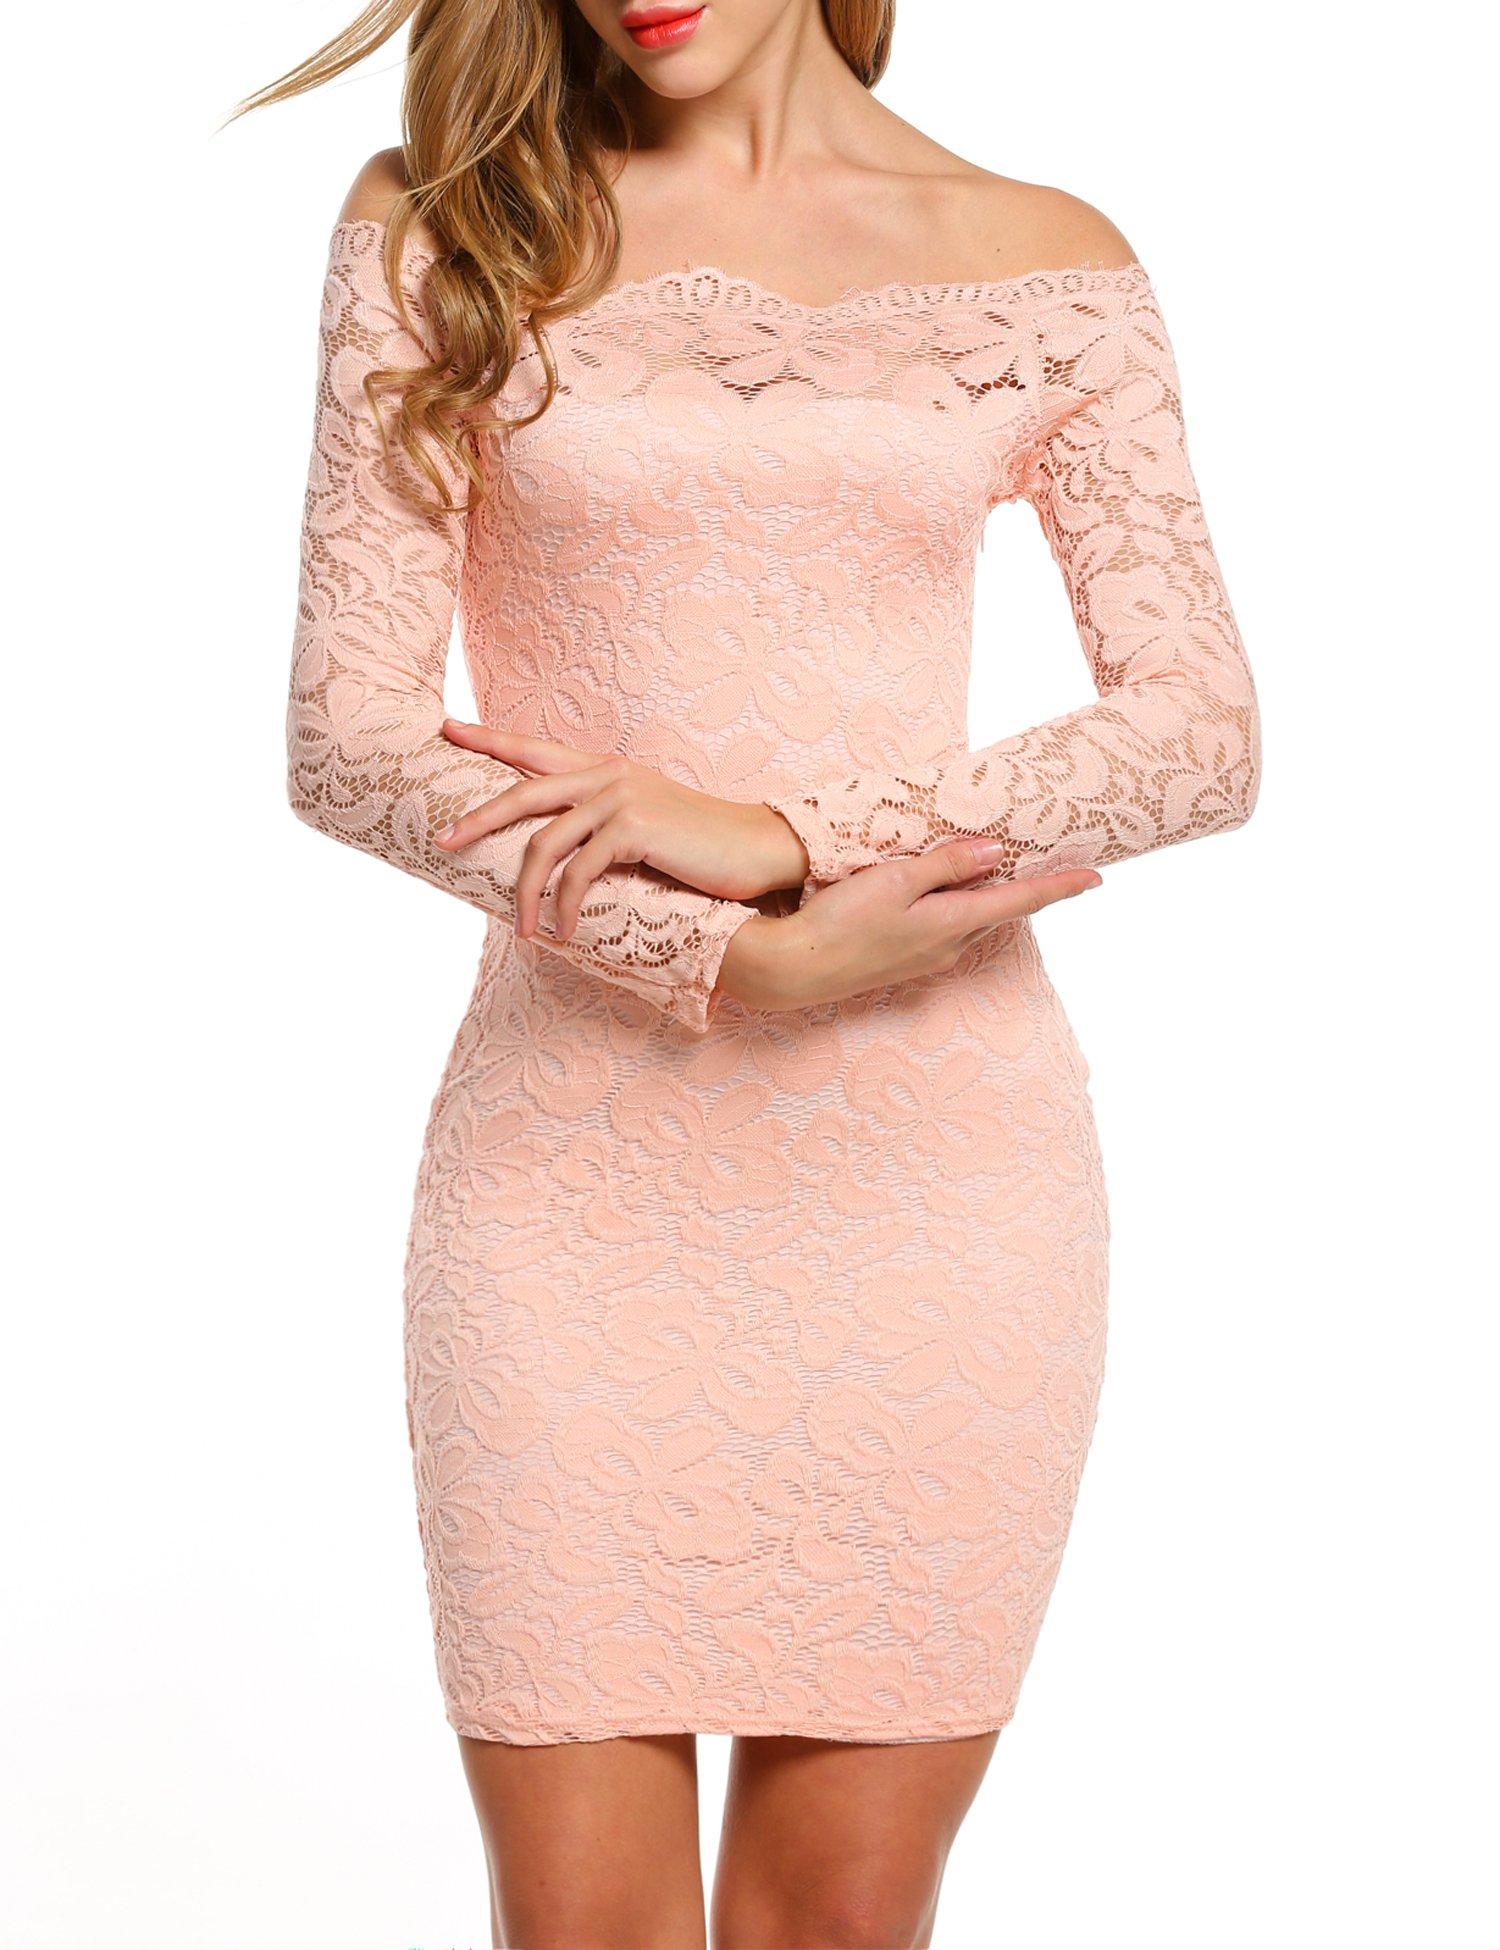 Available at Amazon: ACEVOG Women Off Shoulder Floral Lace Party Dress